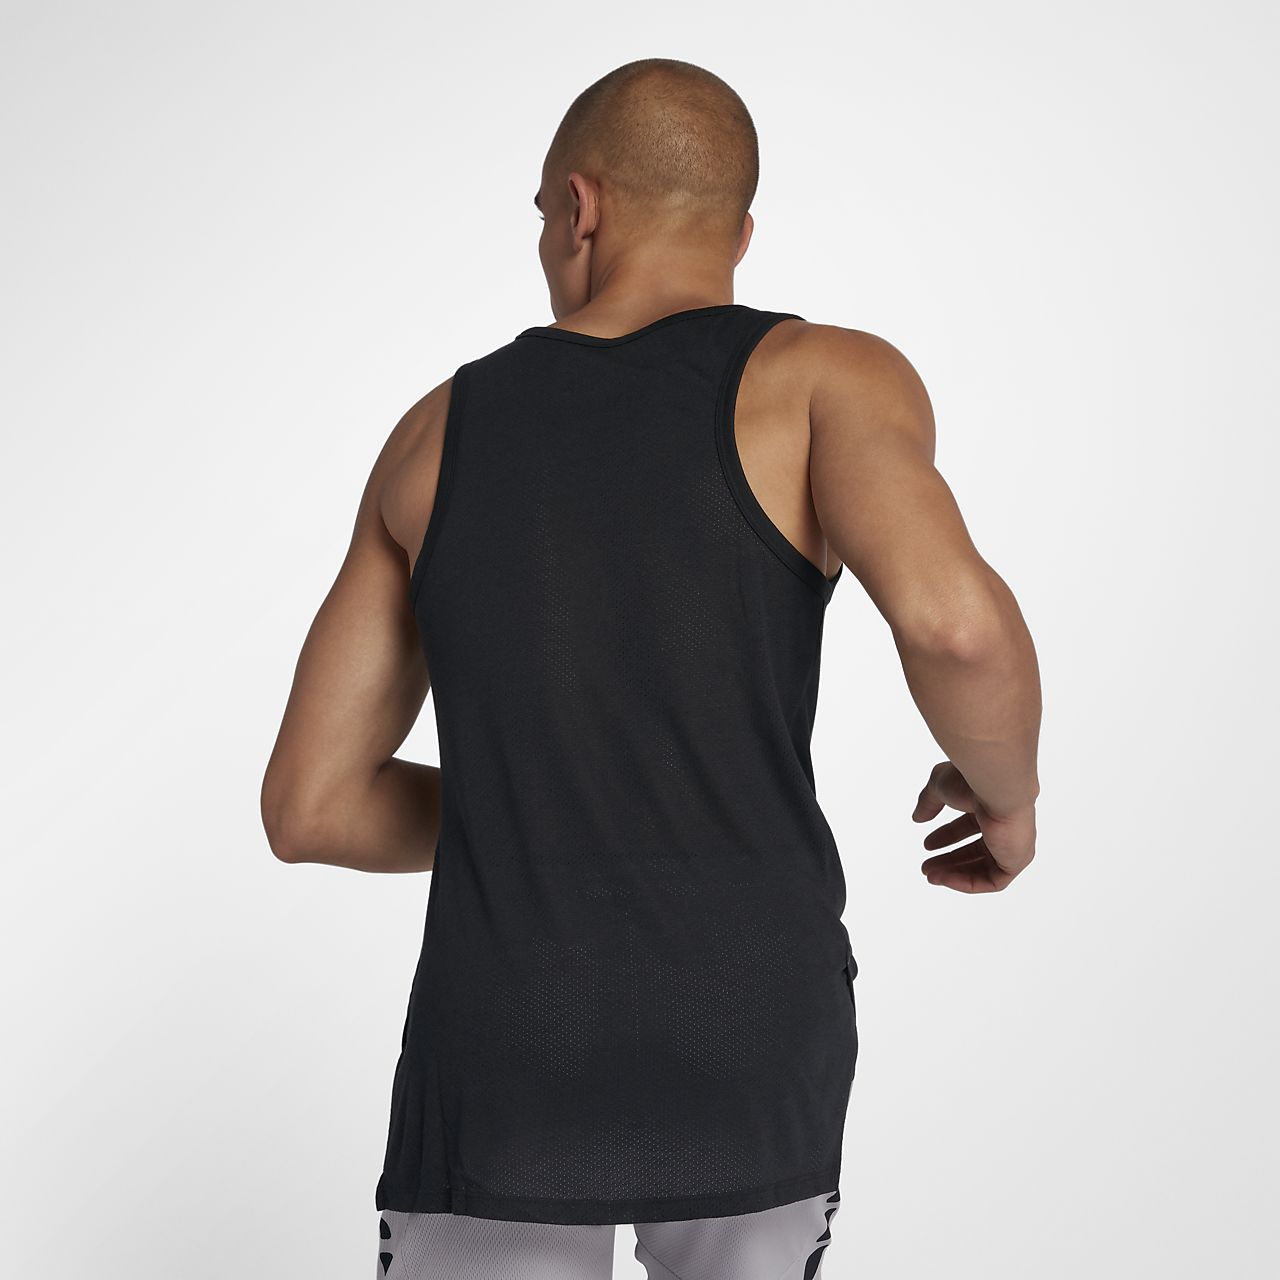 482aa468cdc74 Nike Breathe Elite Men s Sleeveless Basketball Top. Nike.com NL